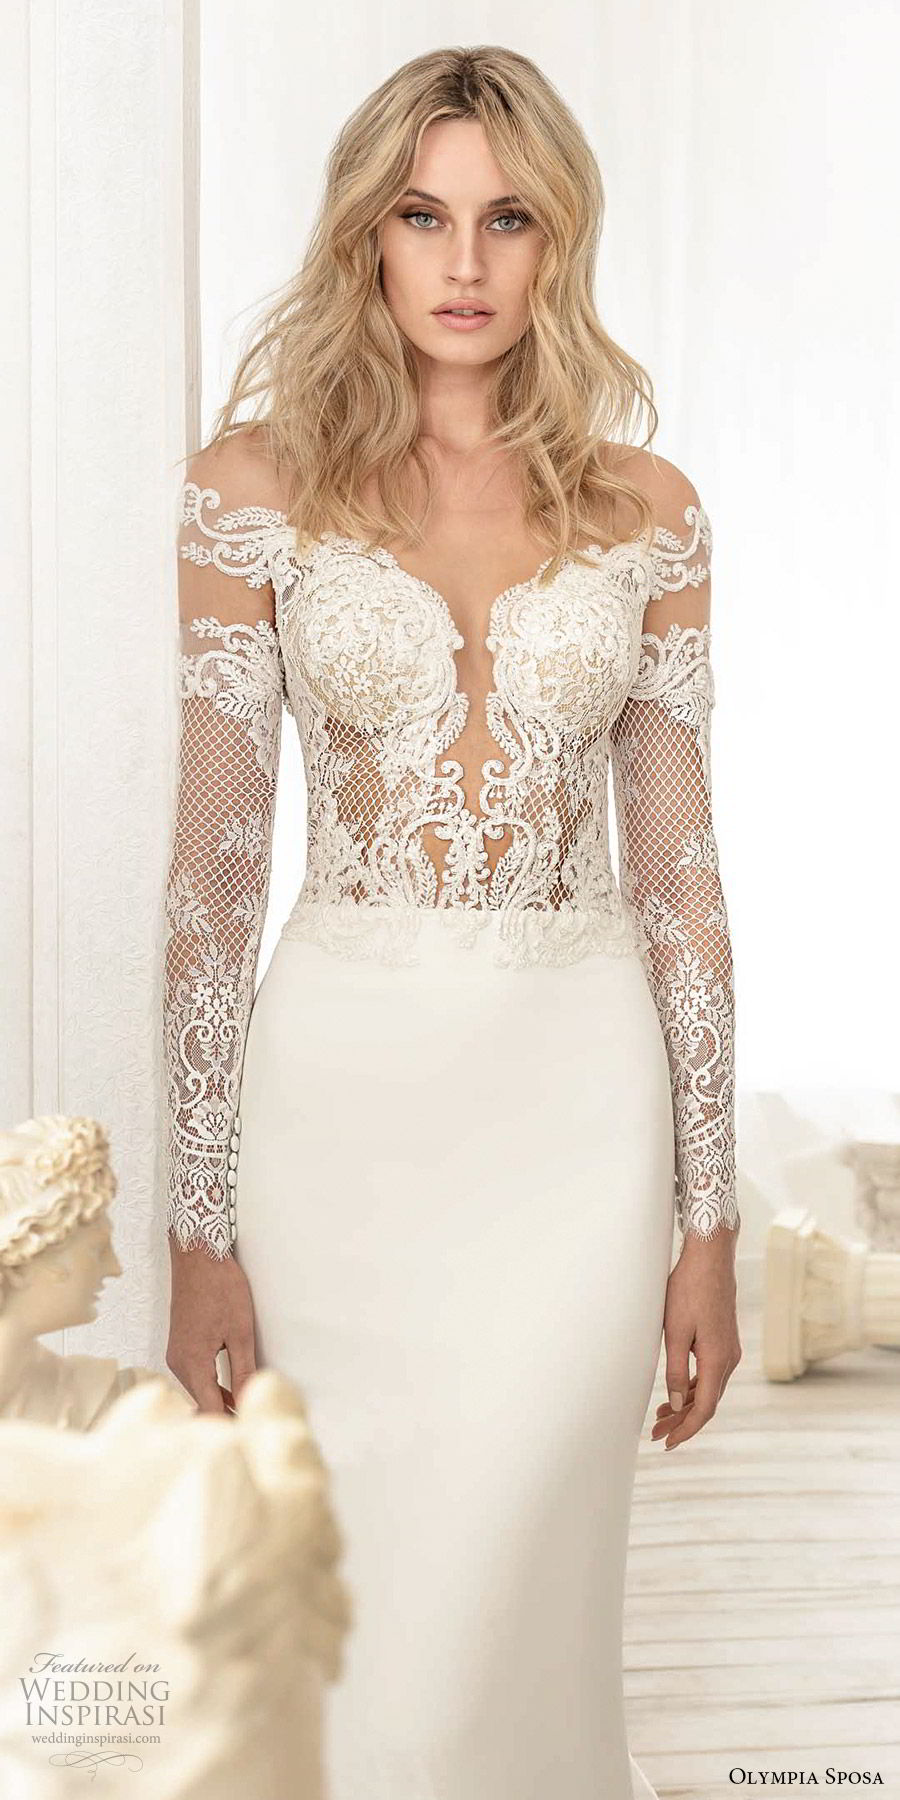 olympia sposa 2020 bridal off shoulder illusion long sleeves heavily embellished bodice sheath wedding dress (9) elegant sexy v back cathedral train zv